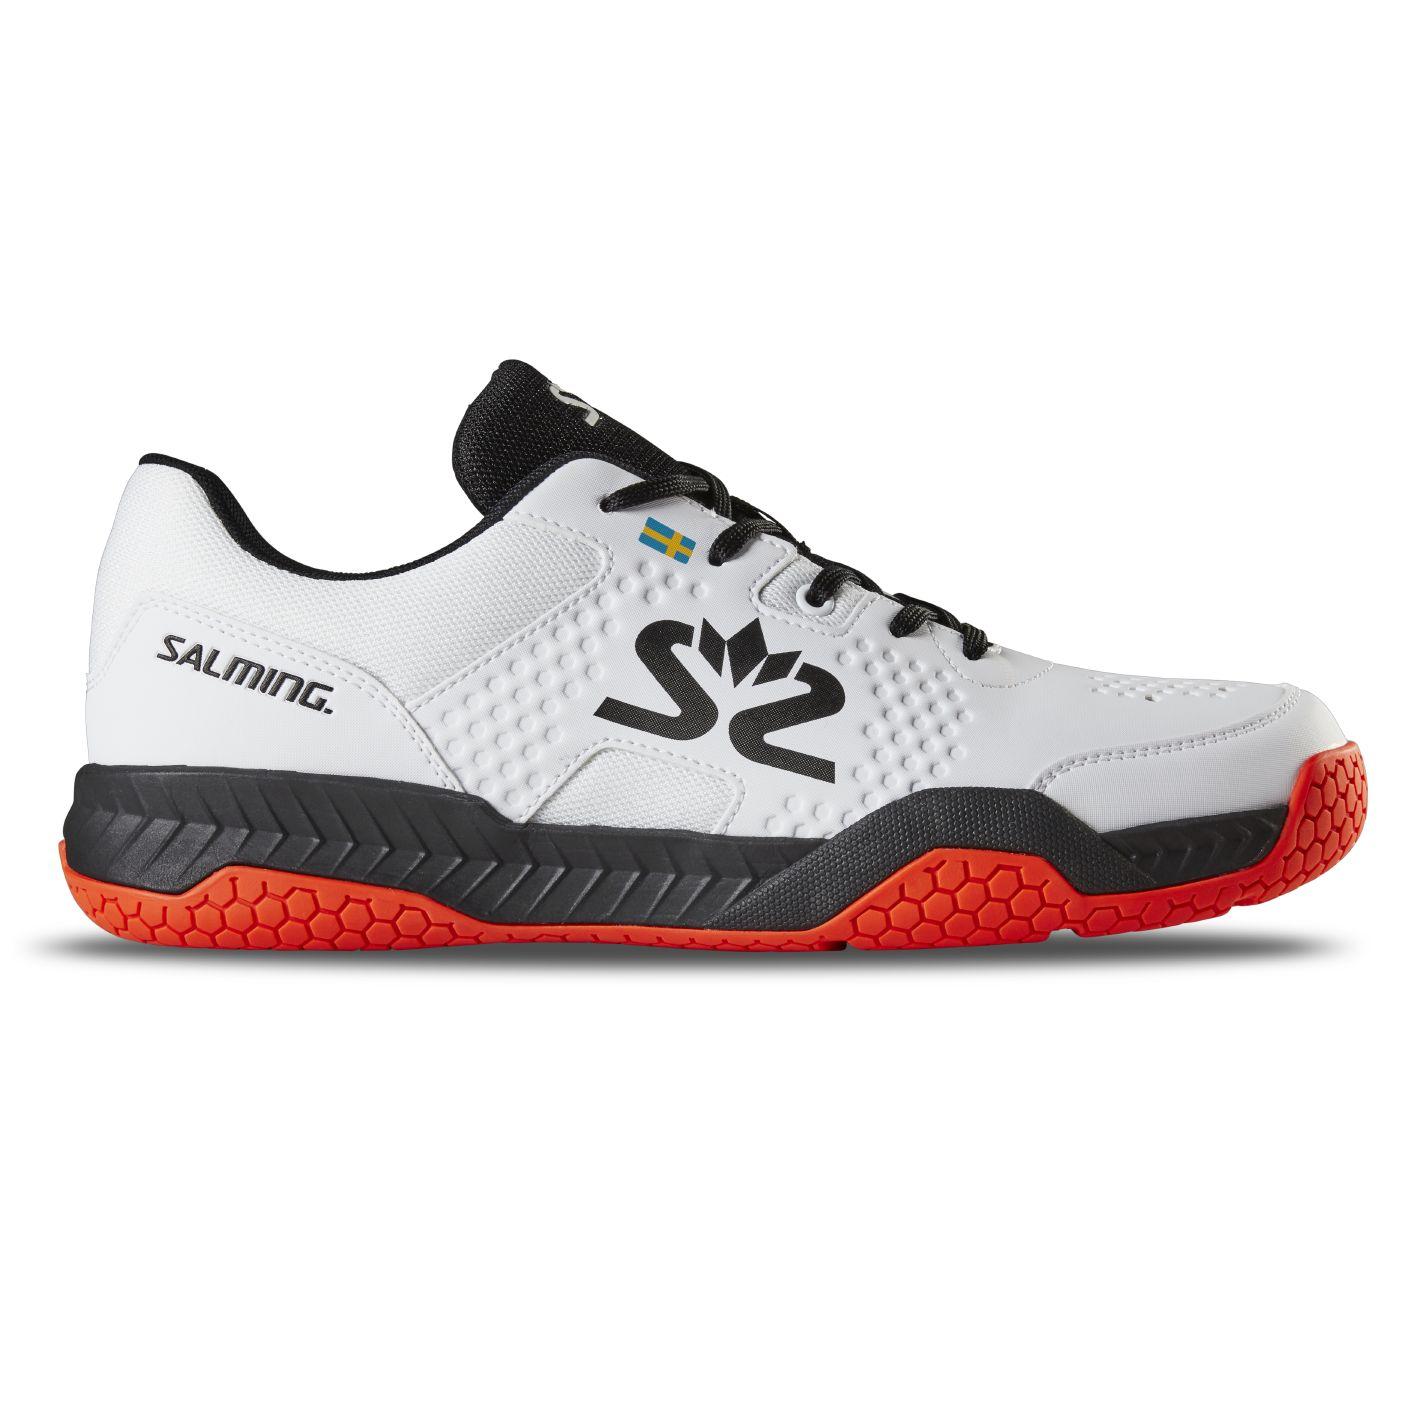 Salming Hawk Court Shoe Men White/Black 9 UK - 44 EUR - 28 cm